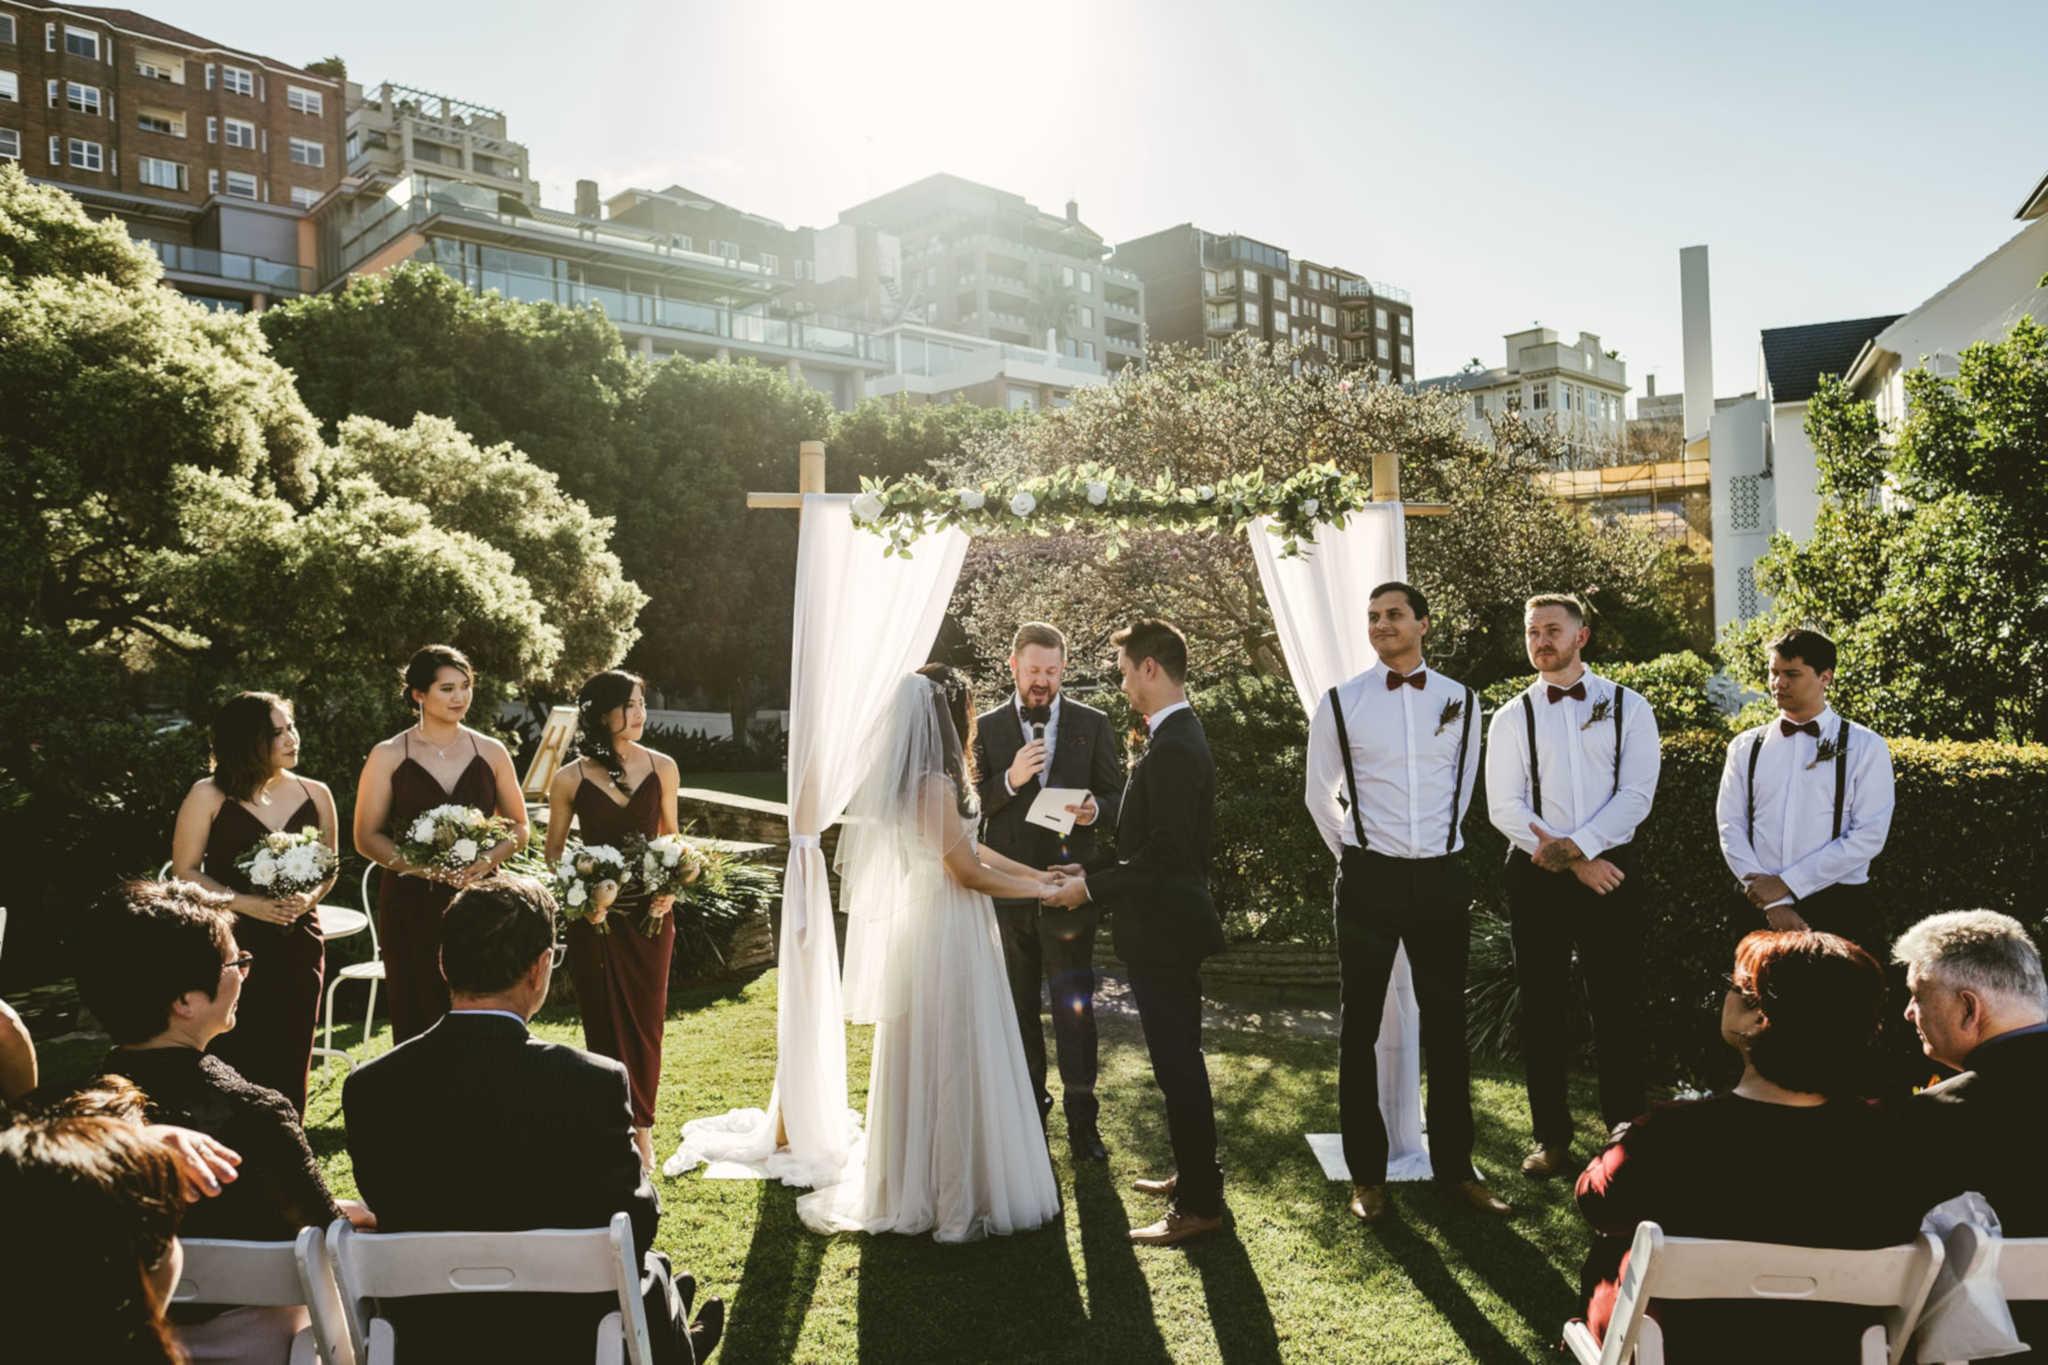 Elizabeth Bay Wedding - Stephen Lee Marriage Celebrant Sydney